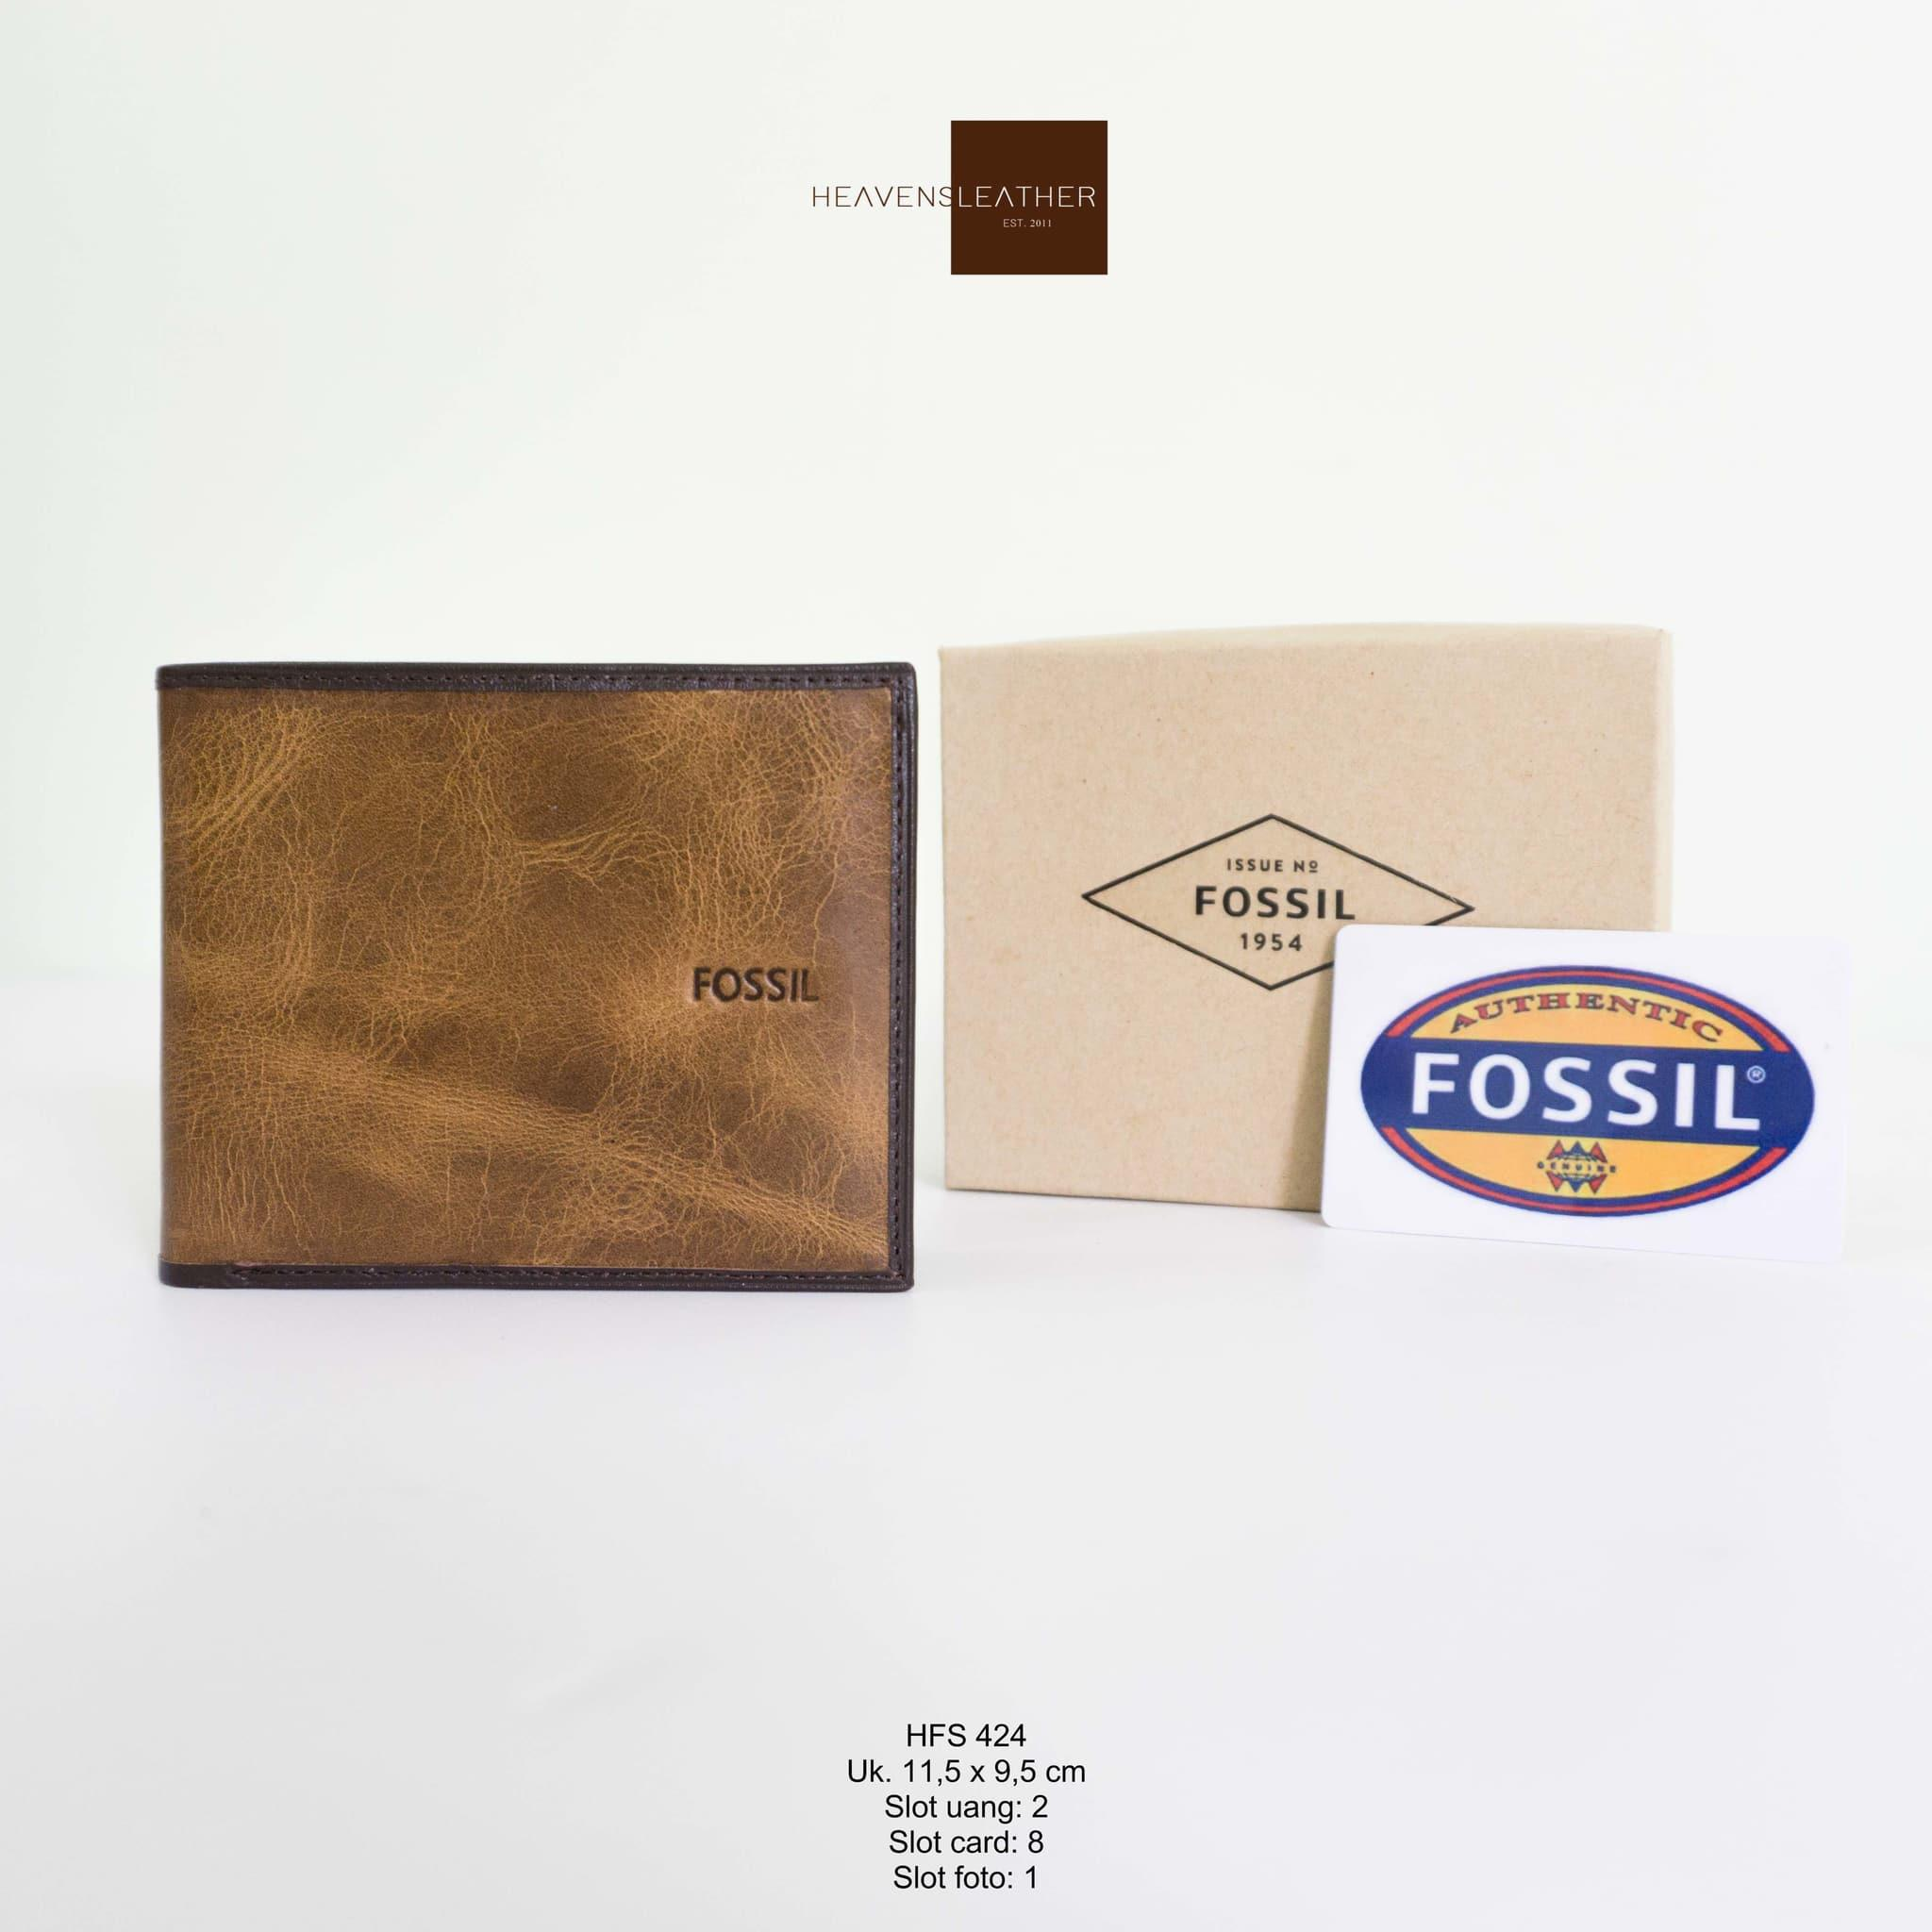 Fossil Peyton Double Flap Crossbody Bag Canteen Zb 6891386 Daftar Piper Small Crimson 6738933 Dompet Pria Kulit Asli Rep Harris Bifold Super Premium Quality